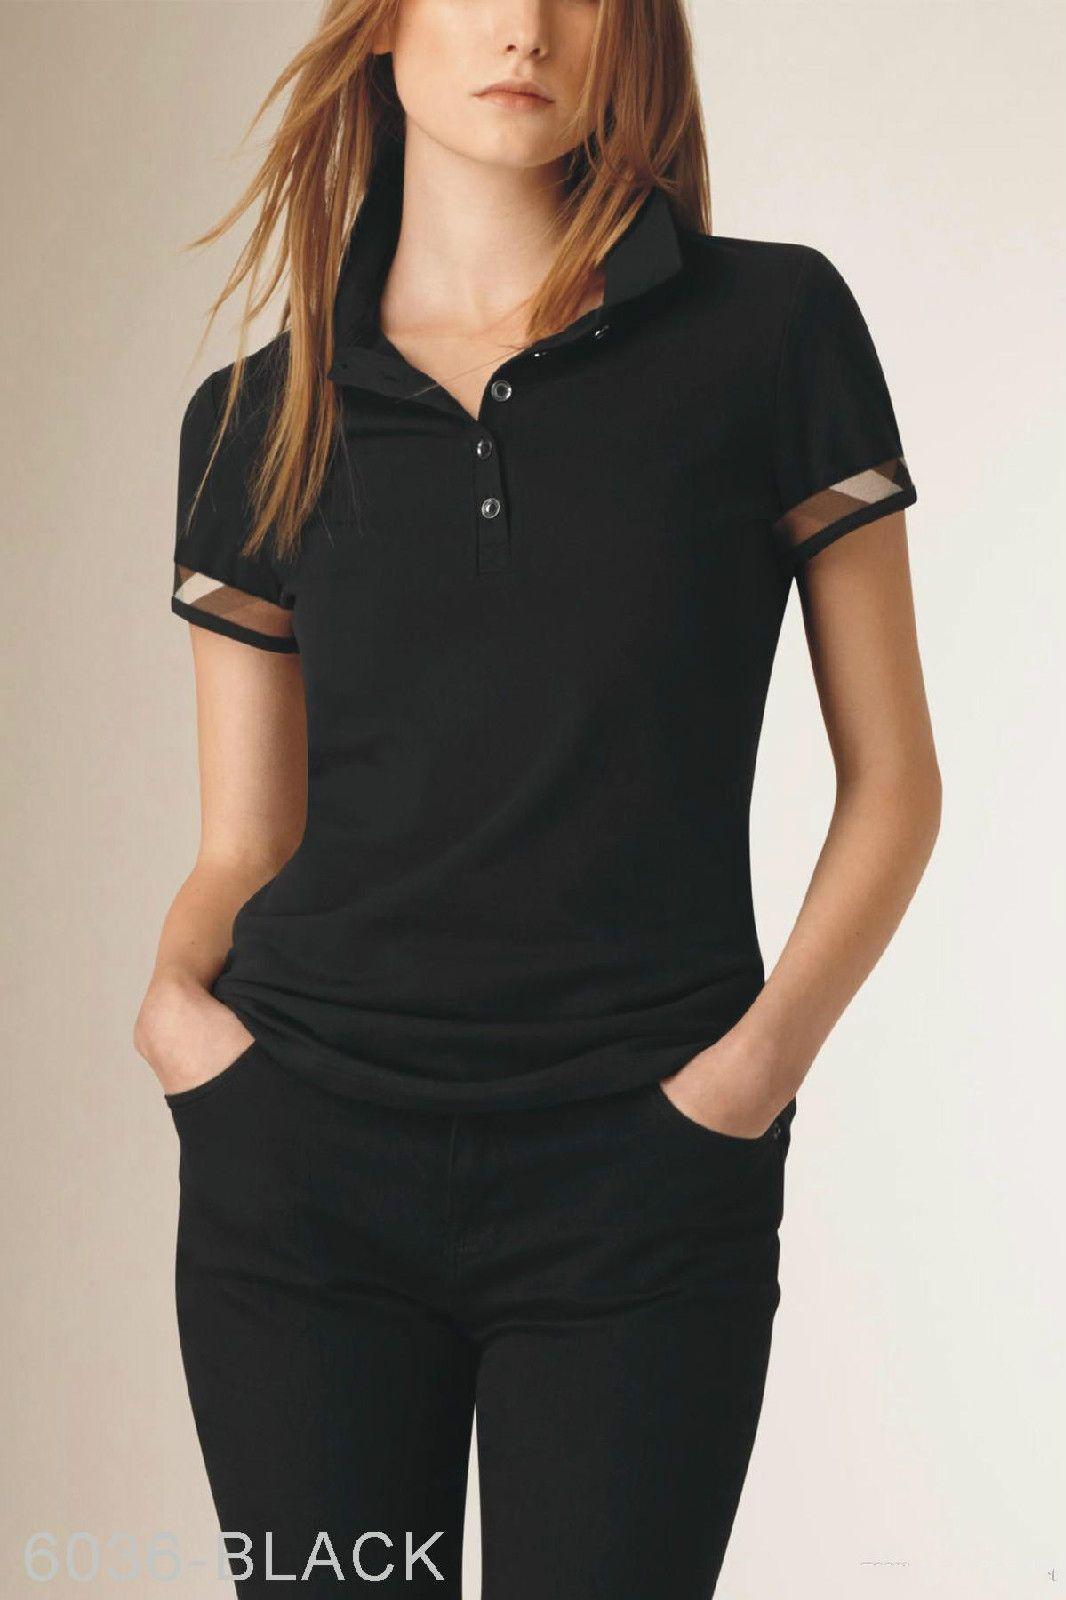 women's black polo shirt